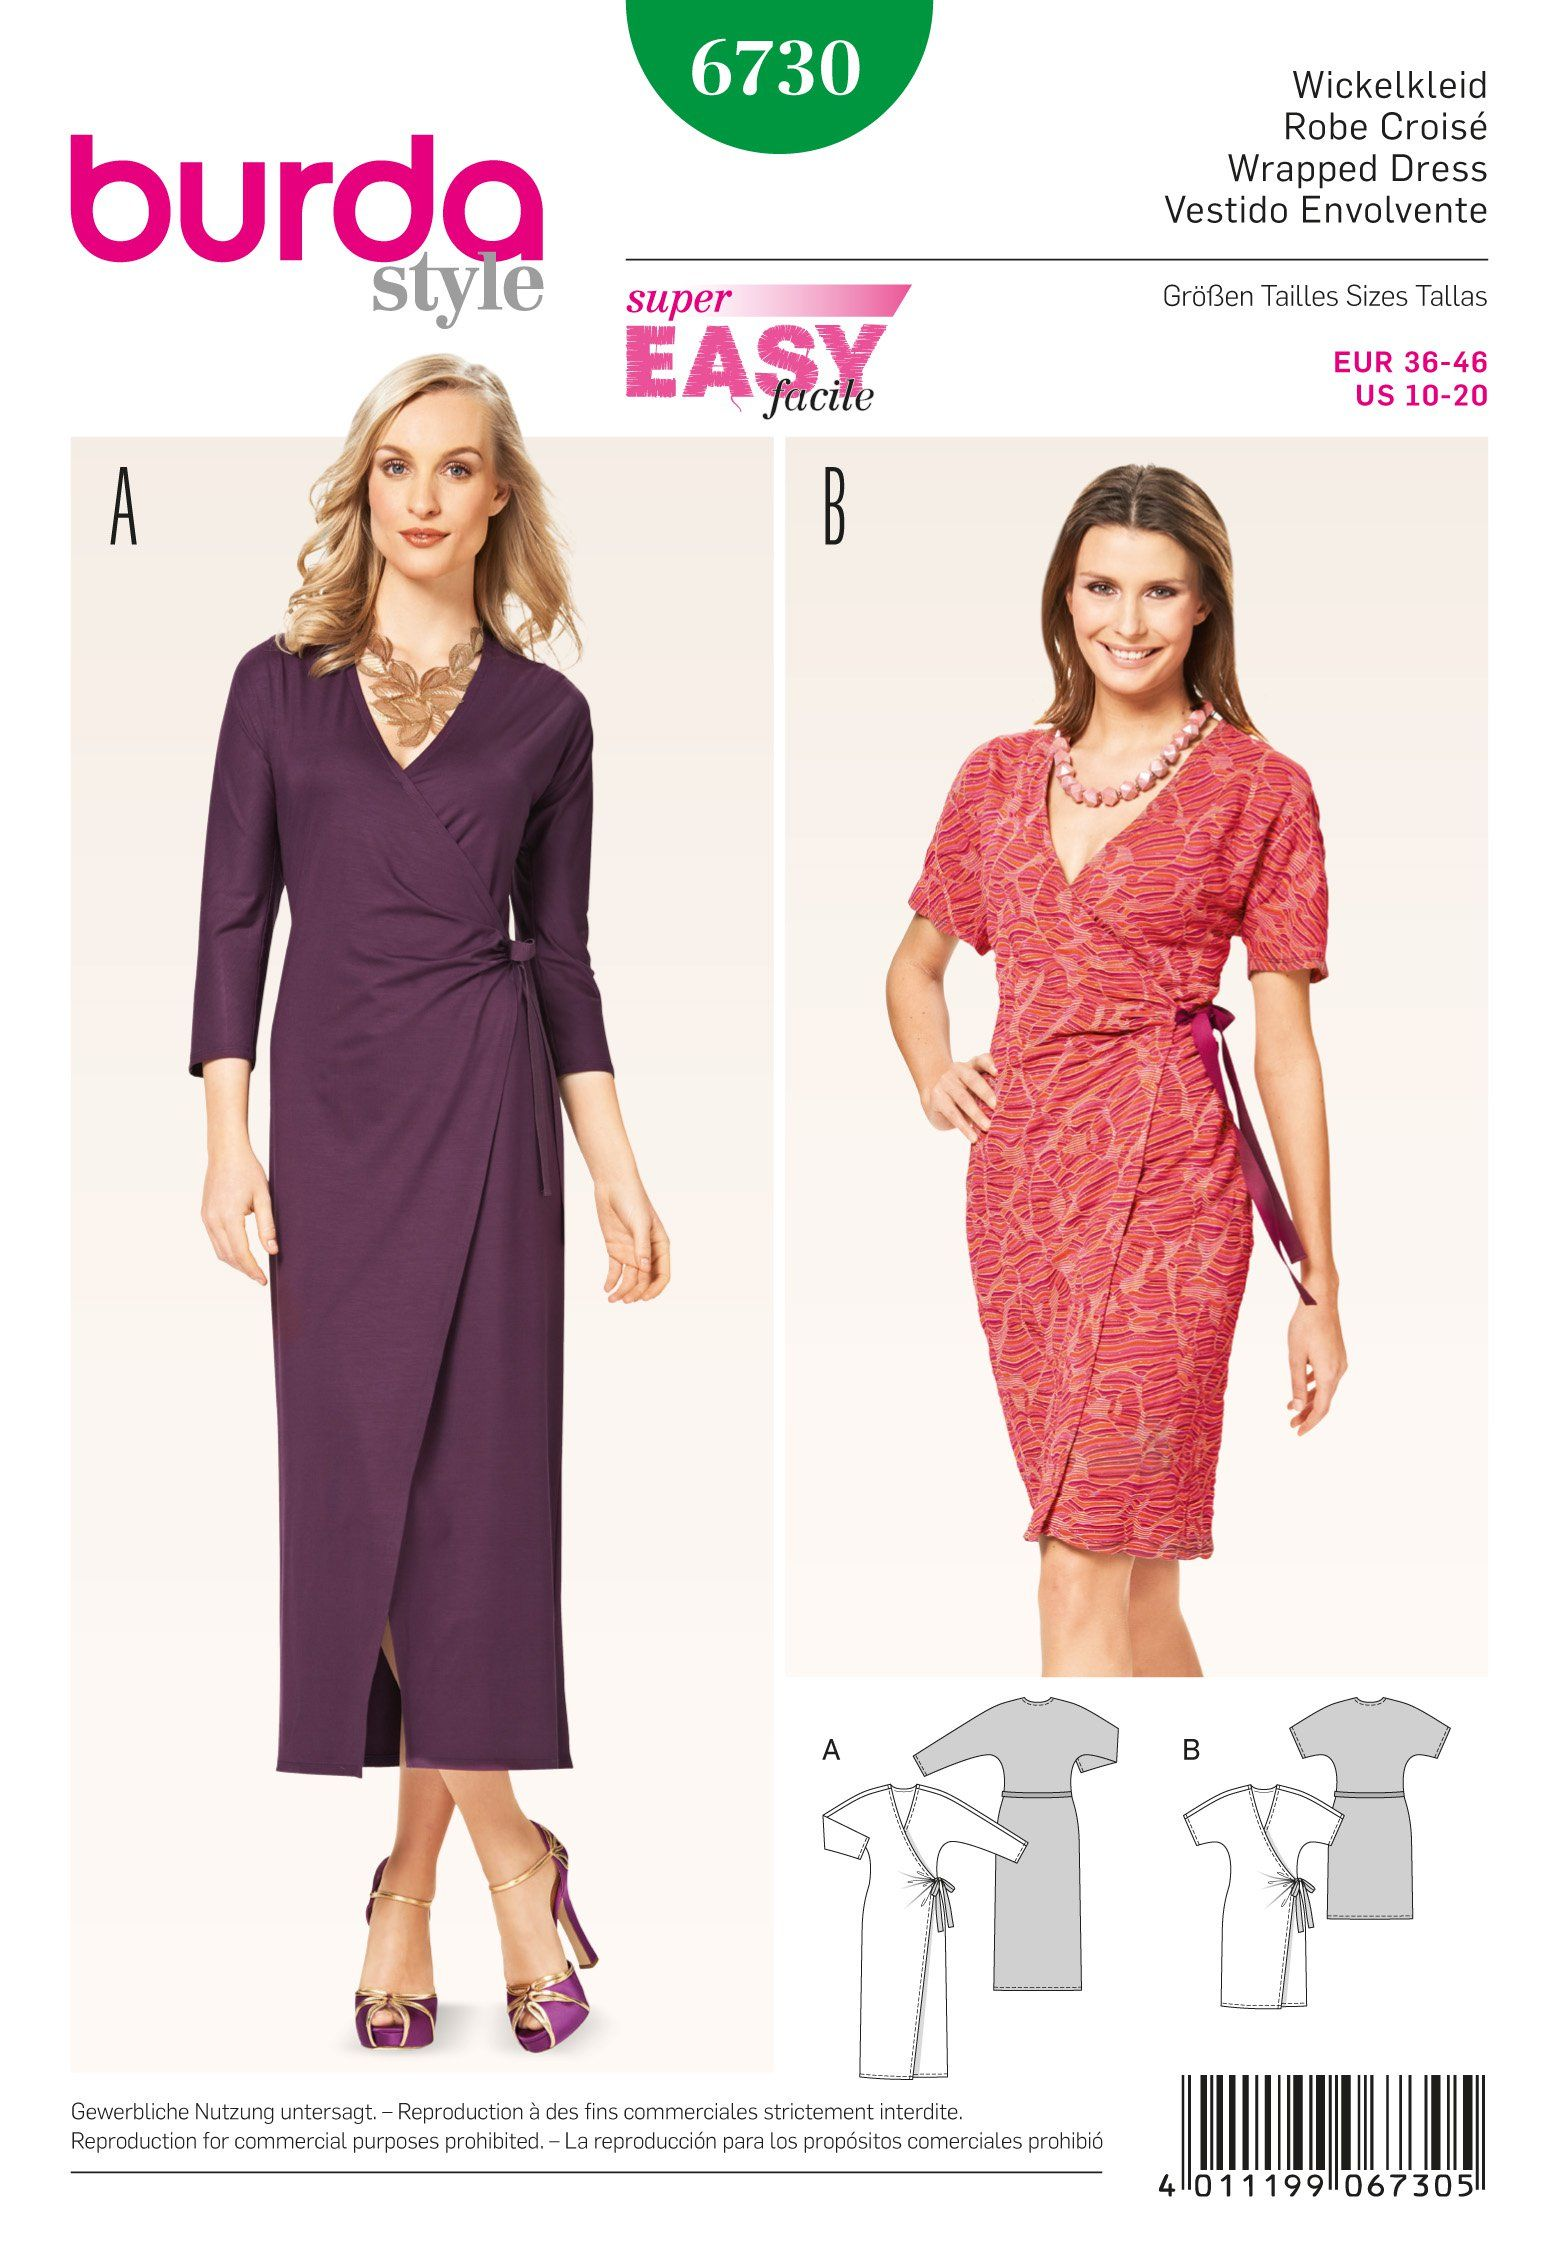 Burda 6730 Misses Wrap Dress With Kimono Sleeves Wrap Dress Sewing Patterns Wrap Dress Pattern Dress Patterns [ 2244 x 1559 Pixel ]